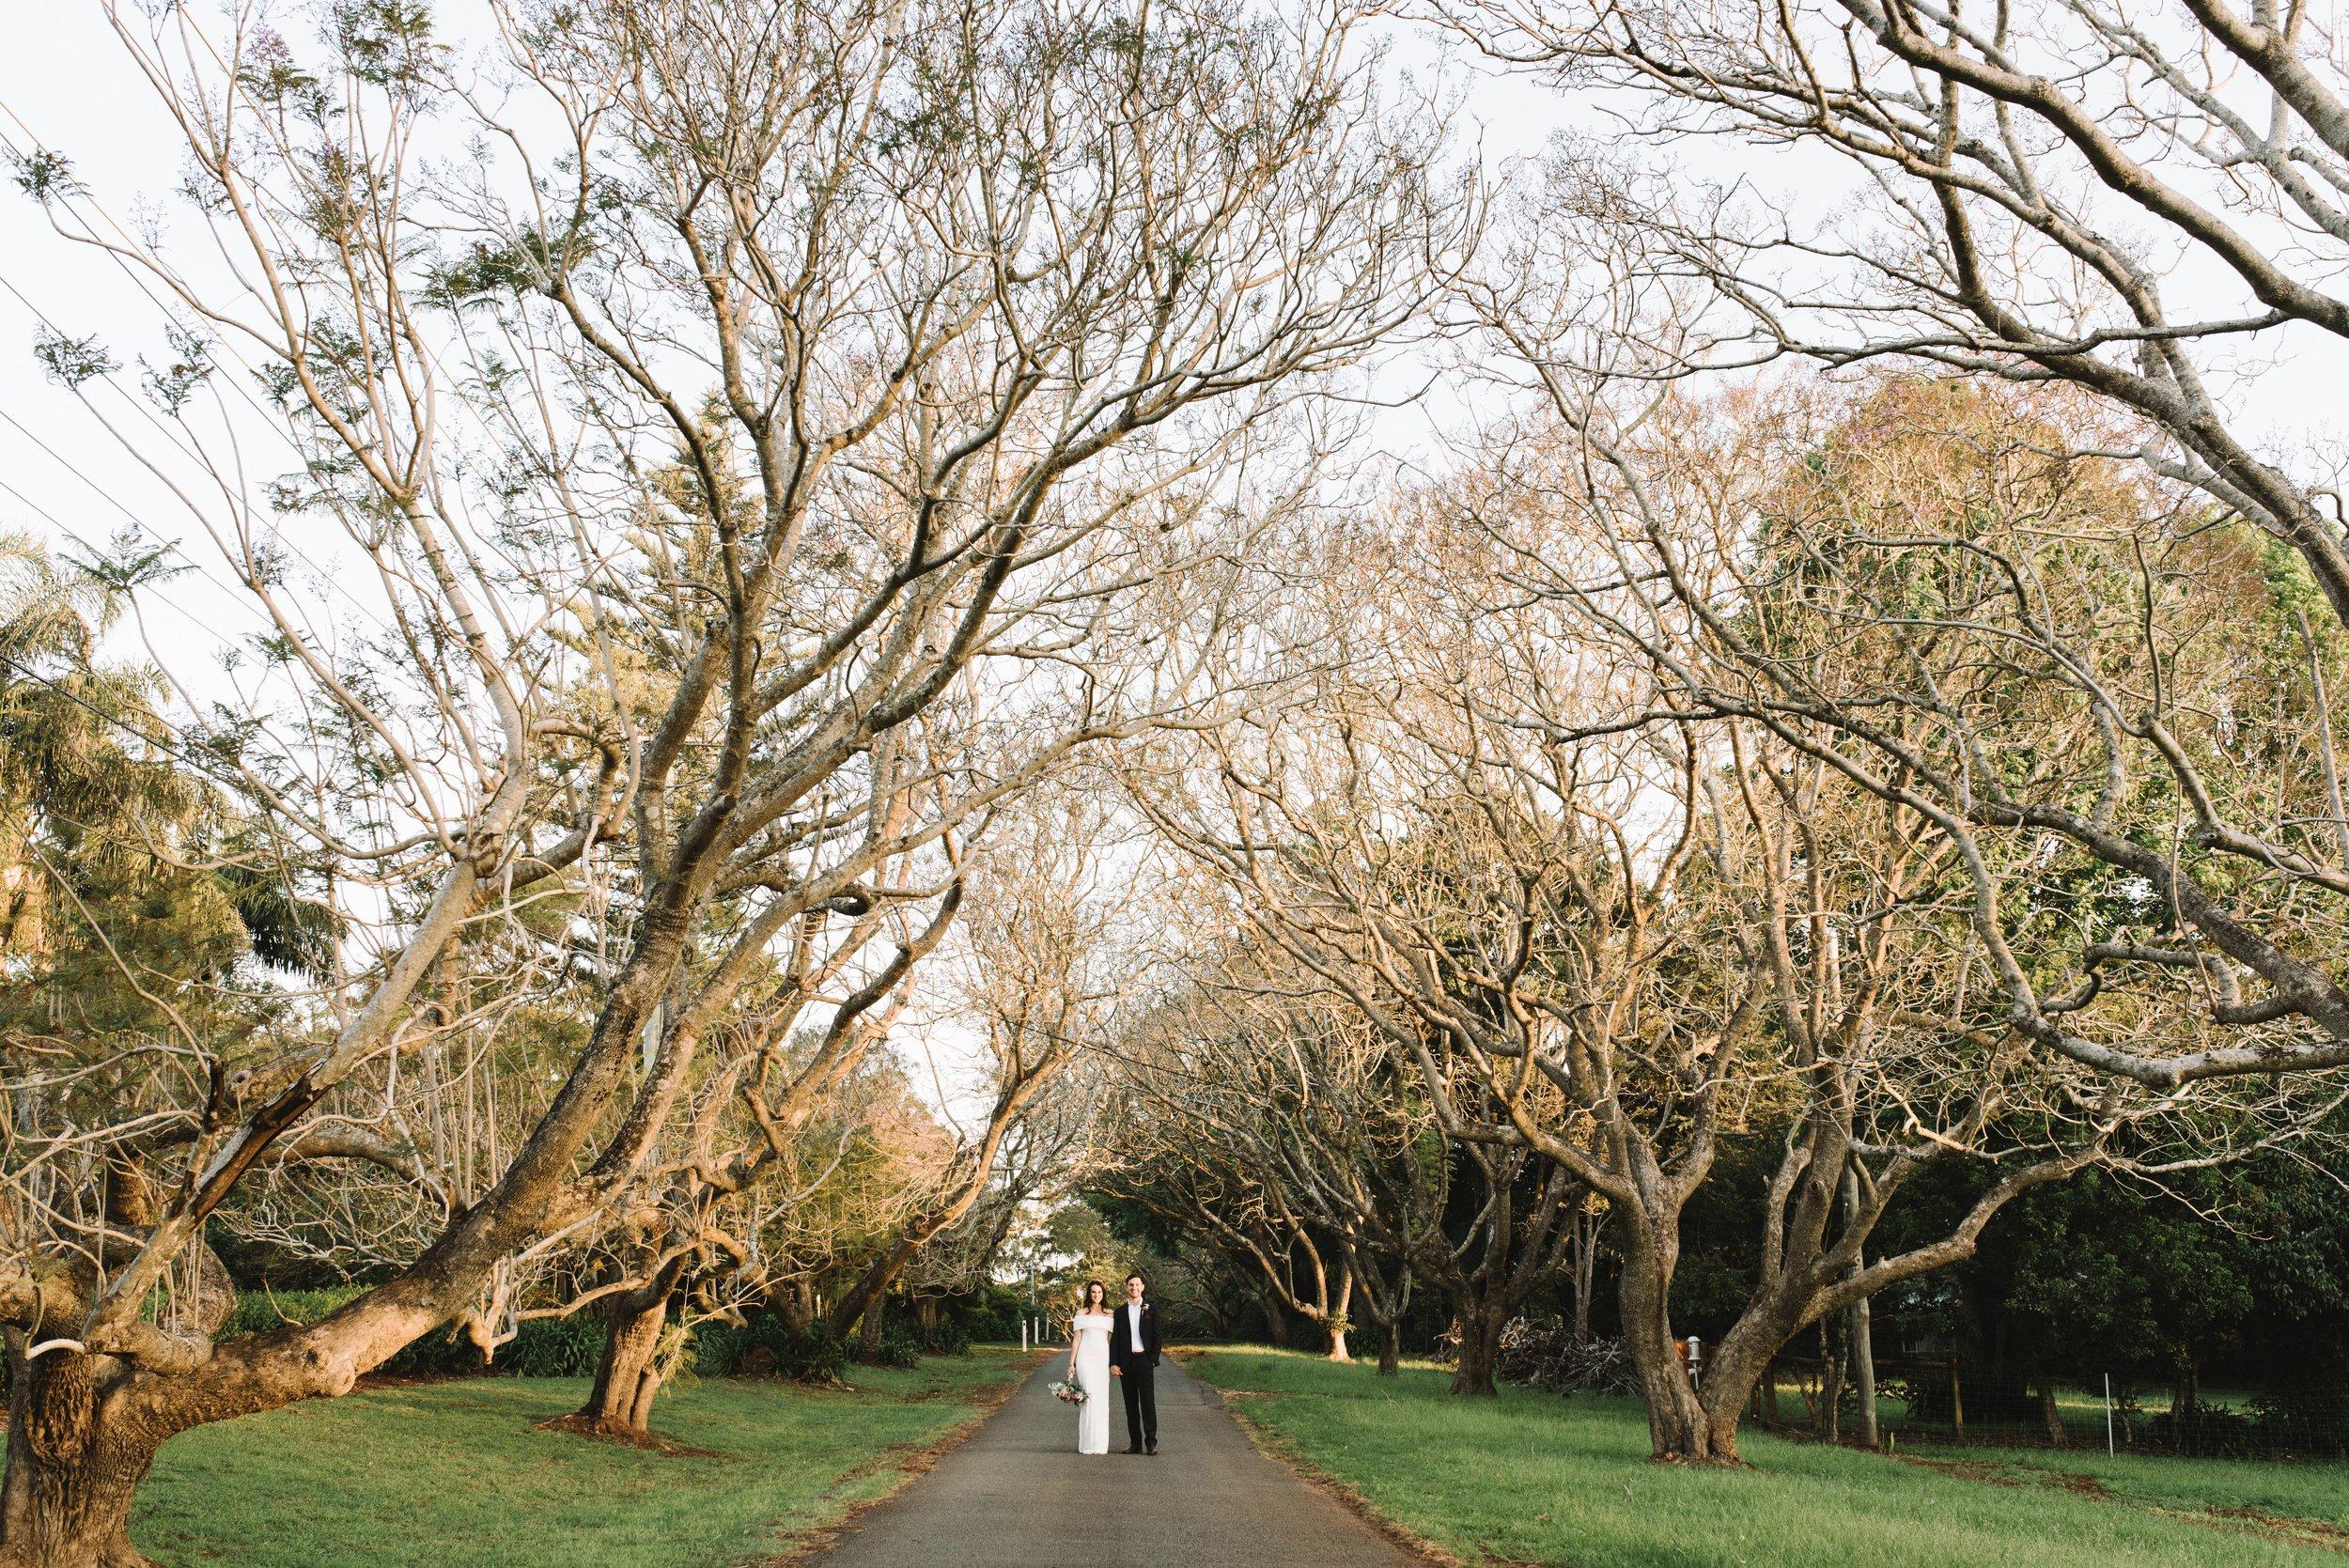 brisbane-gold-coast-sunshine-coast-wedding-photographer-mount-tamborine-wedding-1-59.jpg